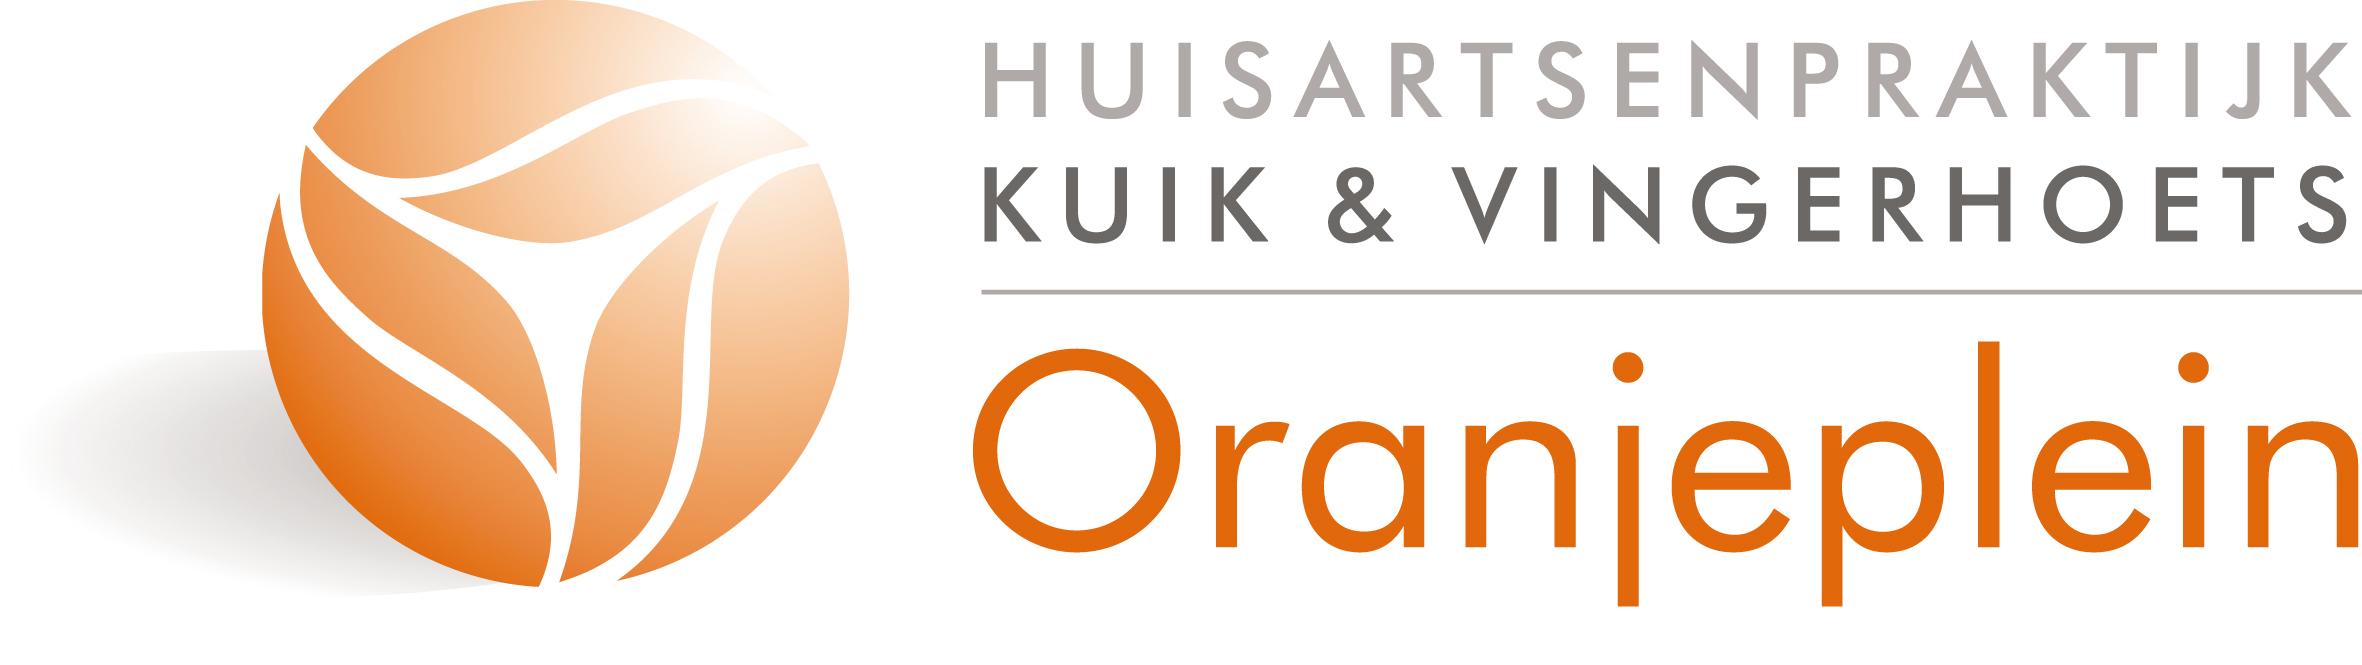 Huisartsenpraktijk Kuik & Vingerhoets